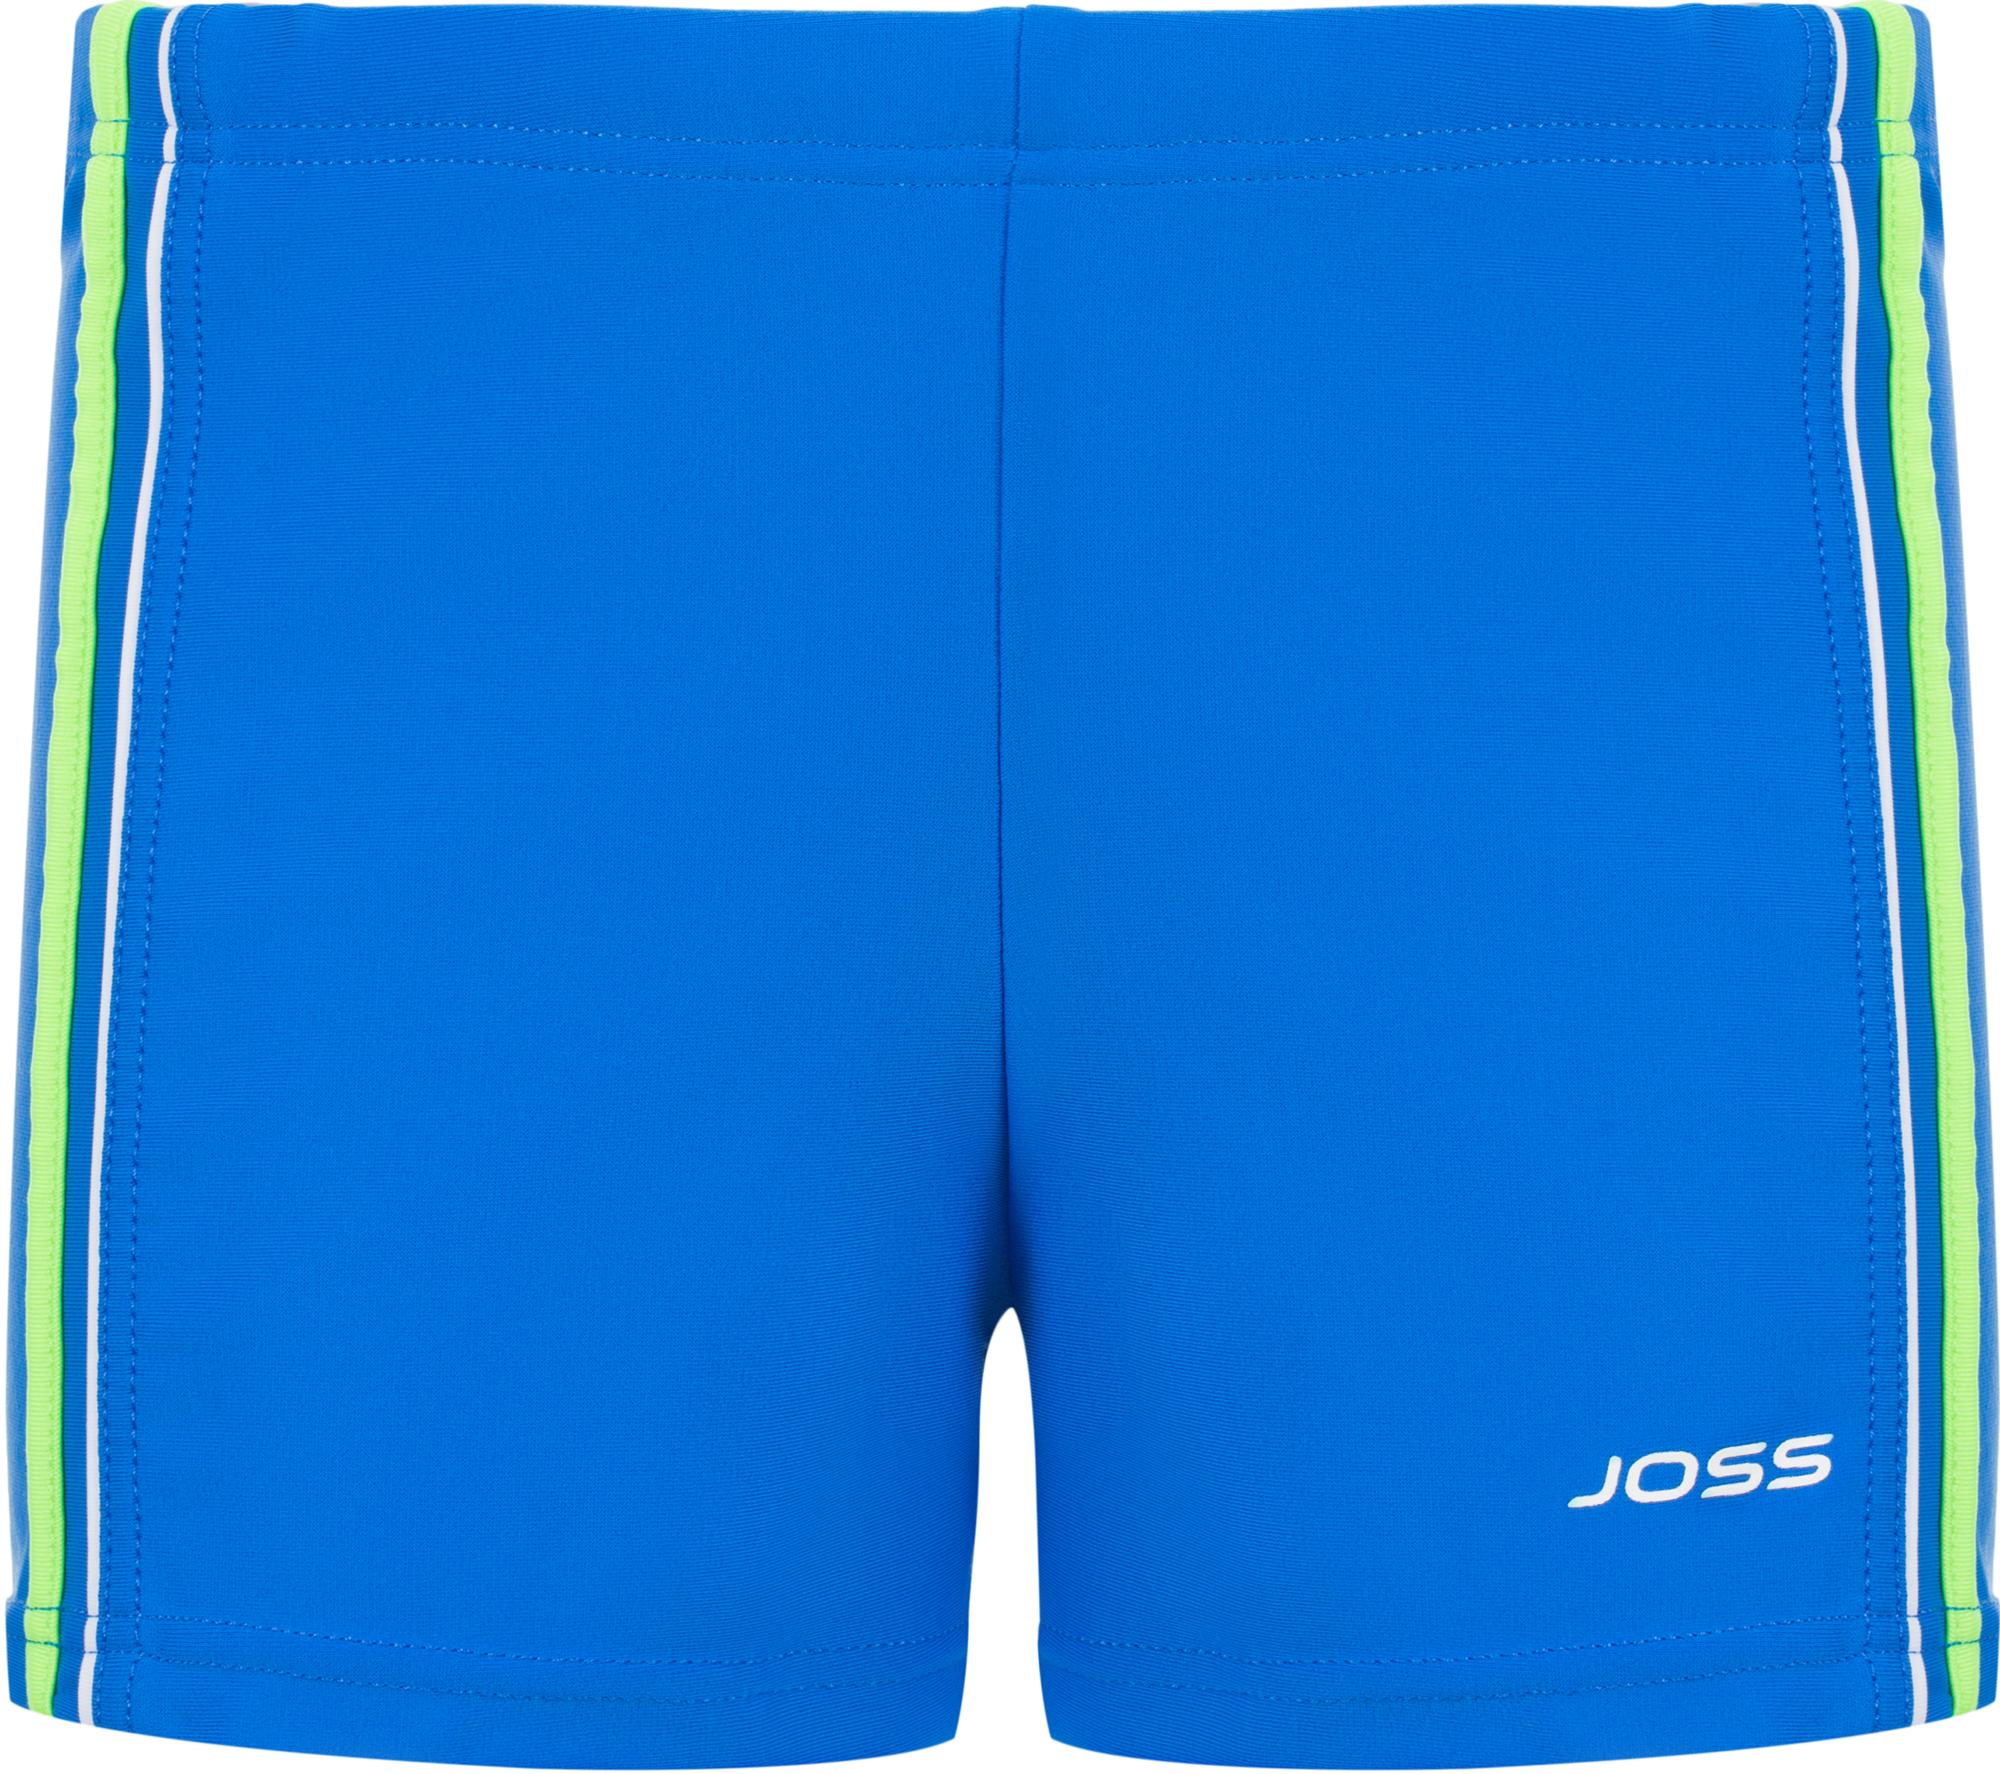 Joss Плавки-шорты для мальчиков Joss, размер 152 joss плавки для мальчиков joss размер 128